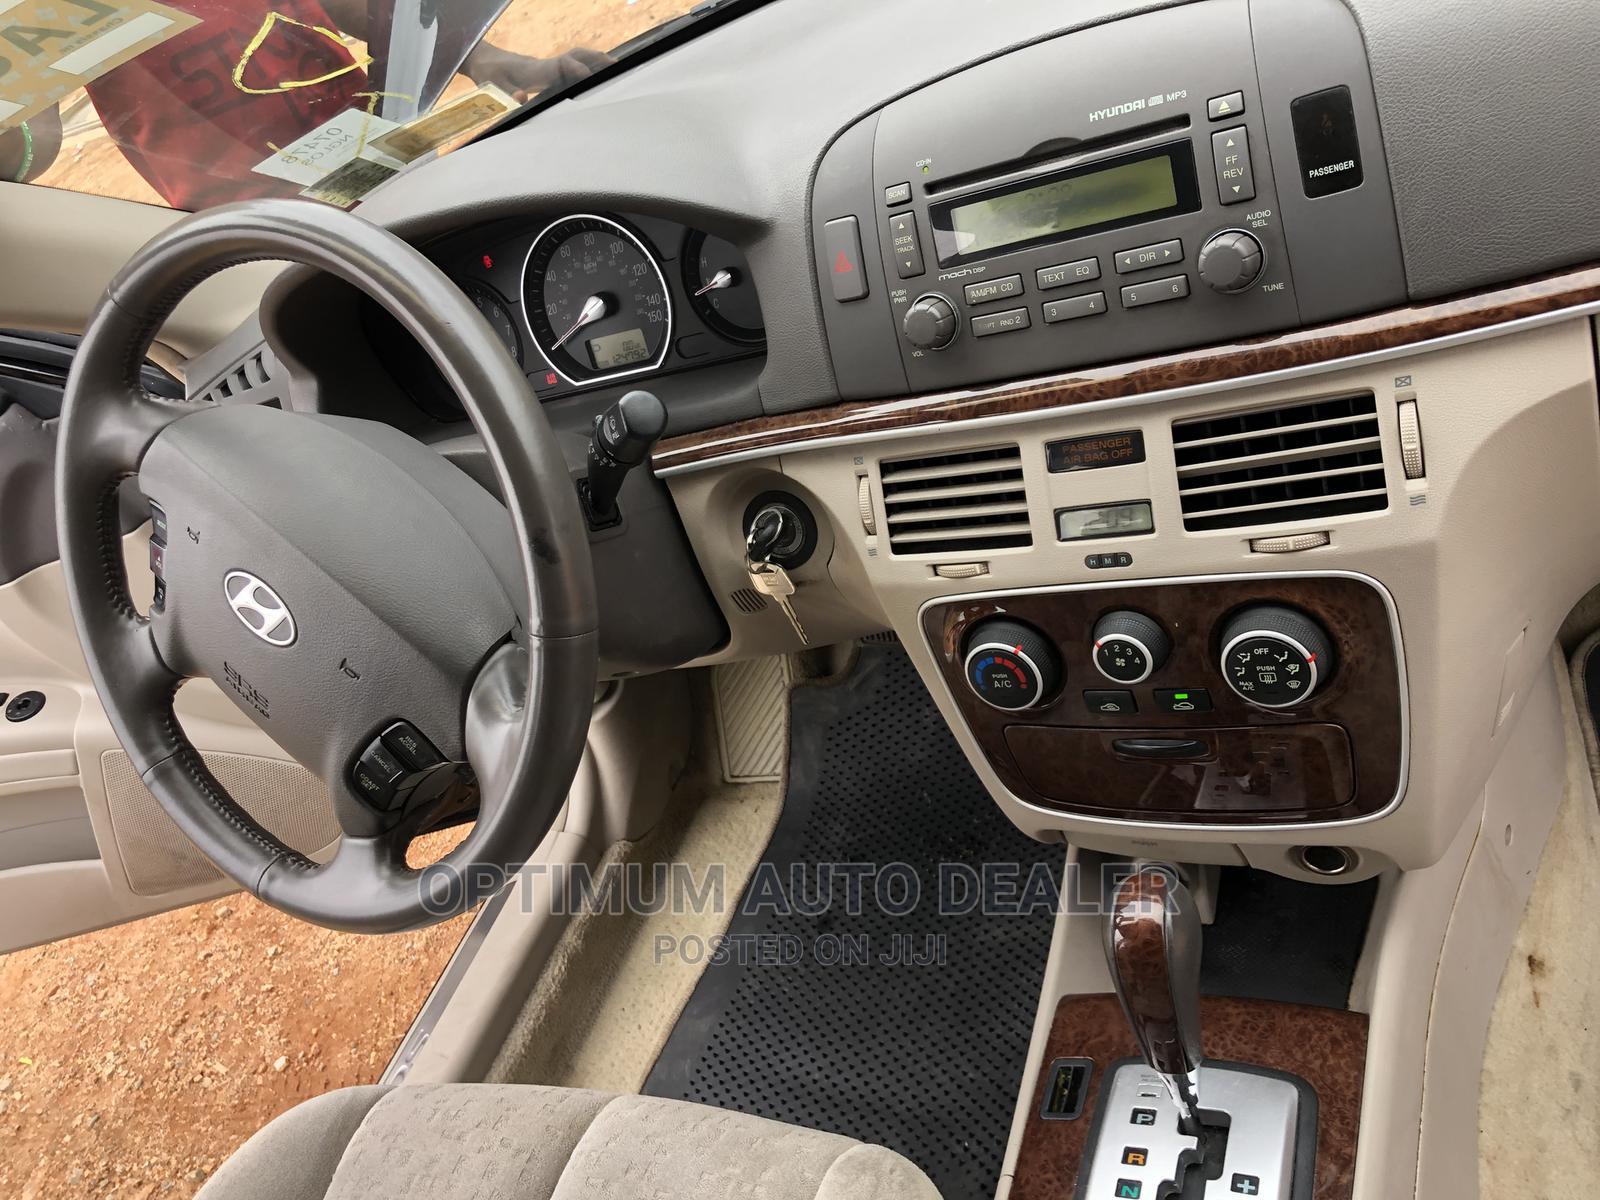 Hyundai Sonata 2006 2.4 Black | Cars for sale in Ife, Osun State, Nigeria